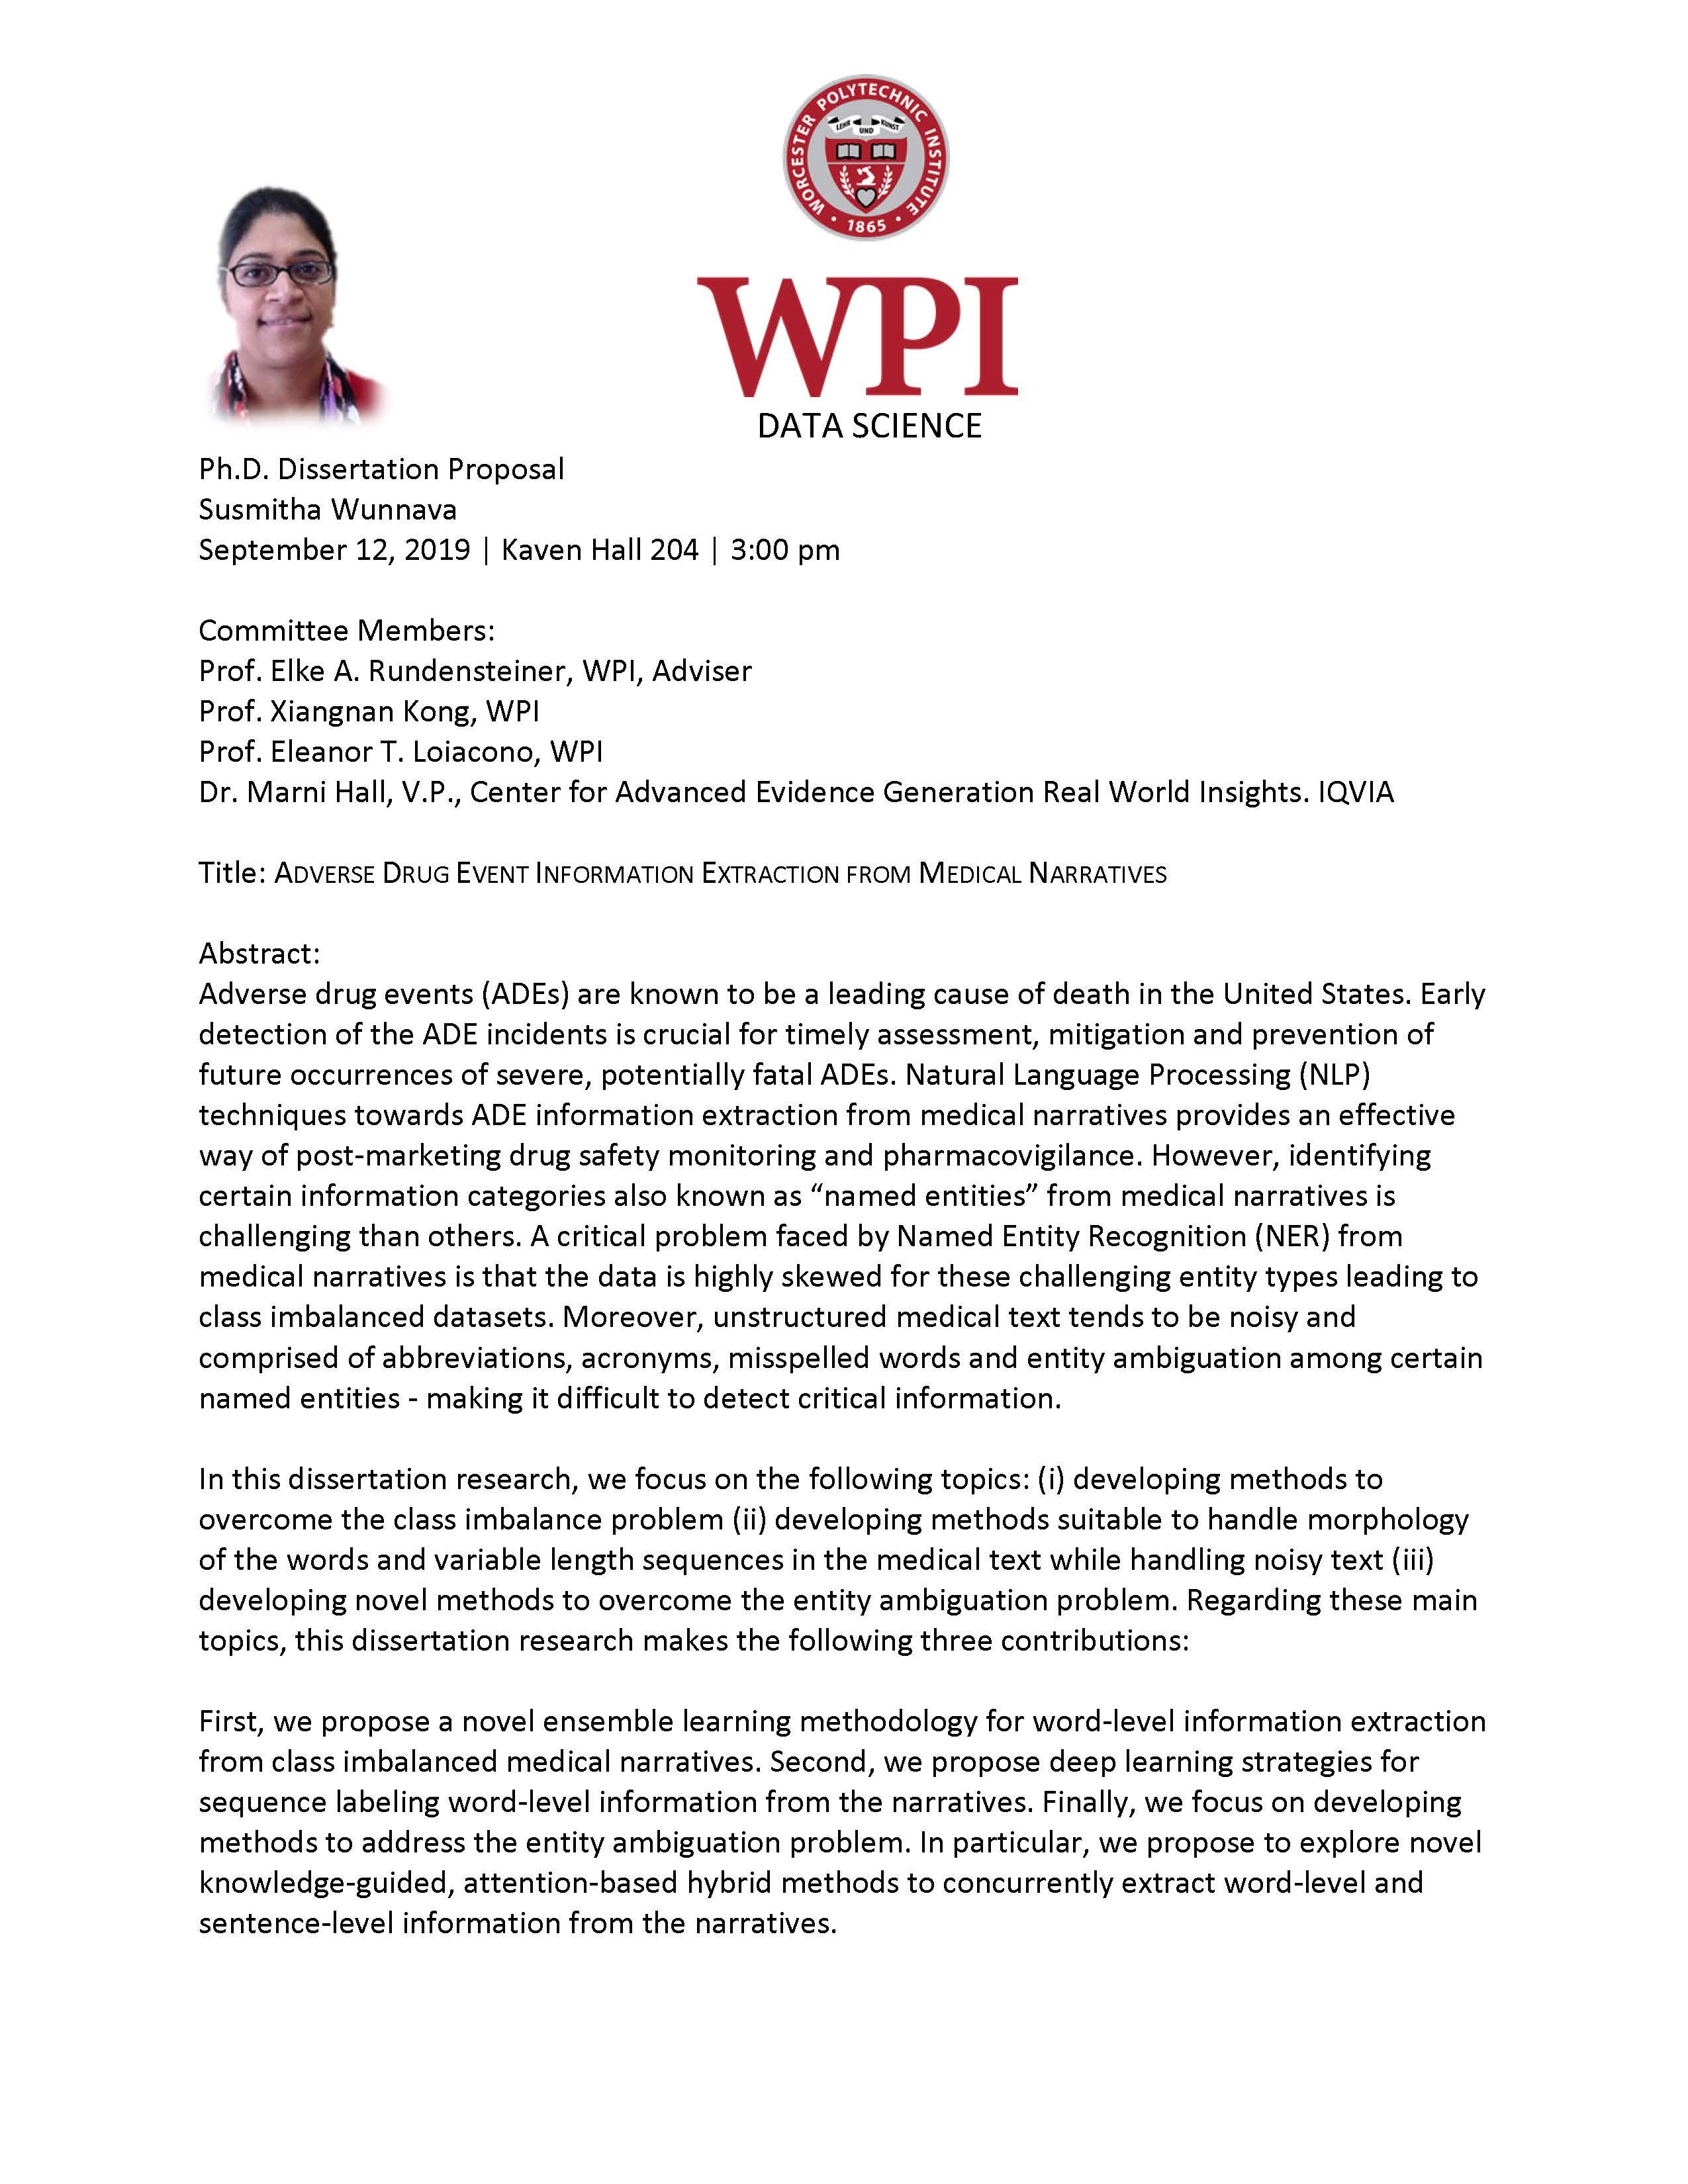 Susmitha Wunnava Ph.D. Dissertation Proposal alt